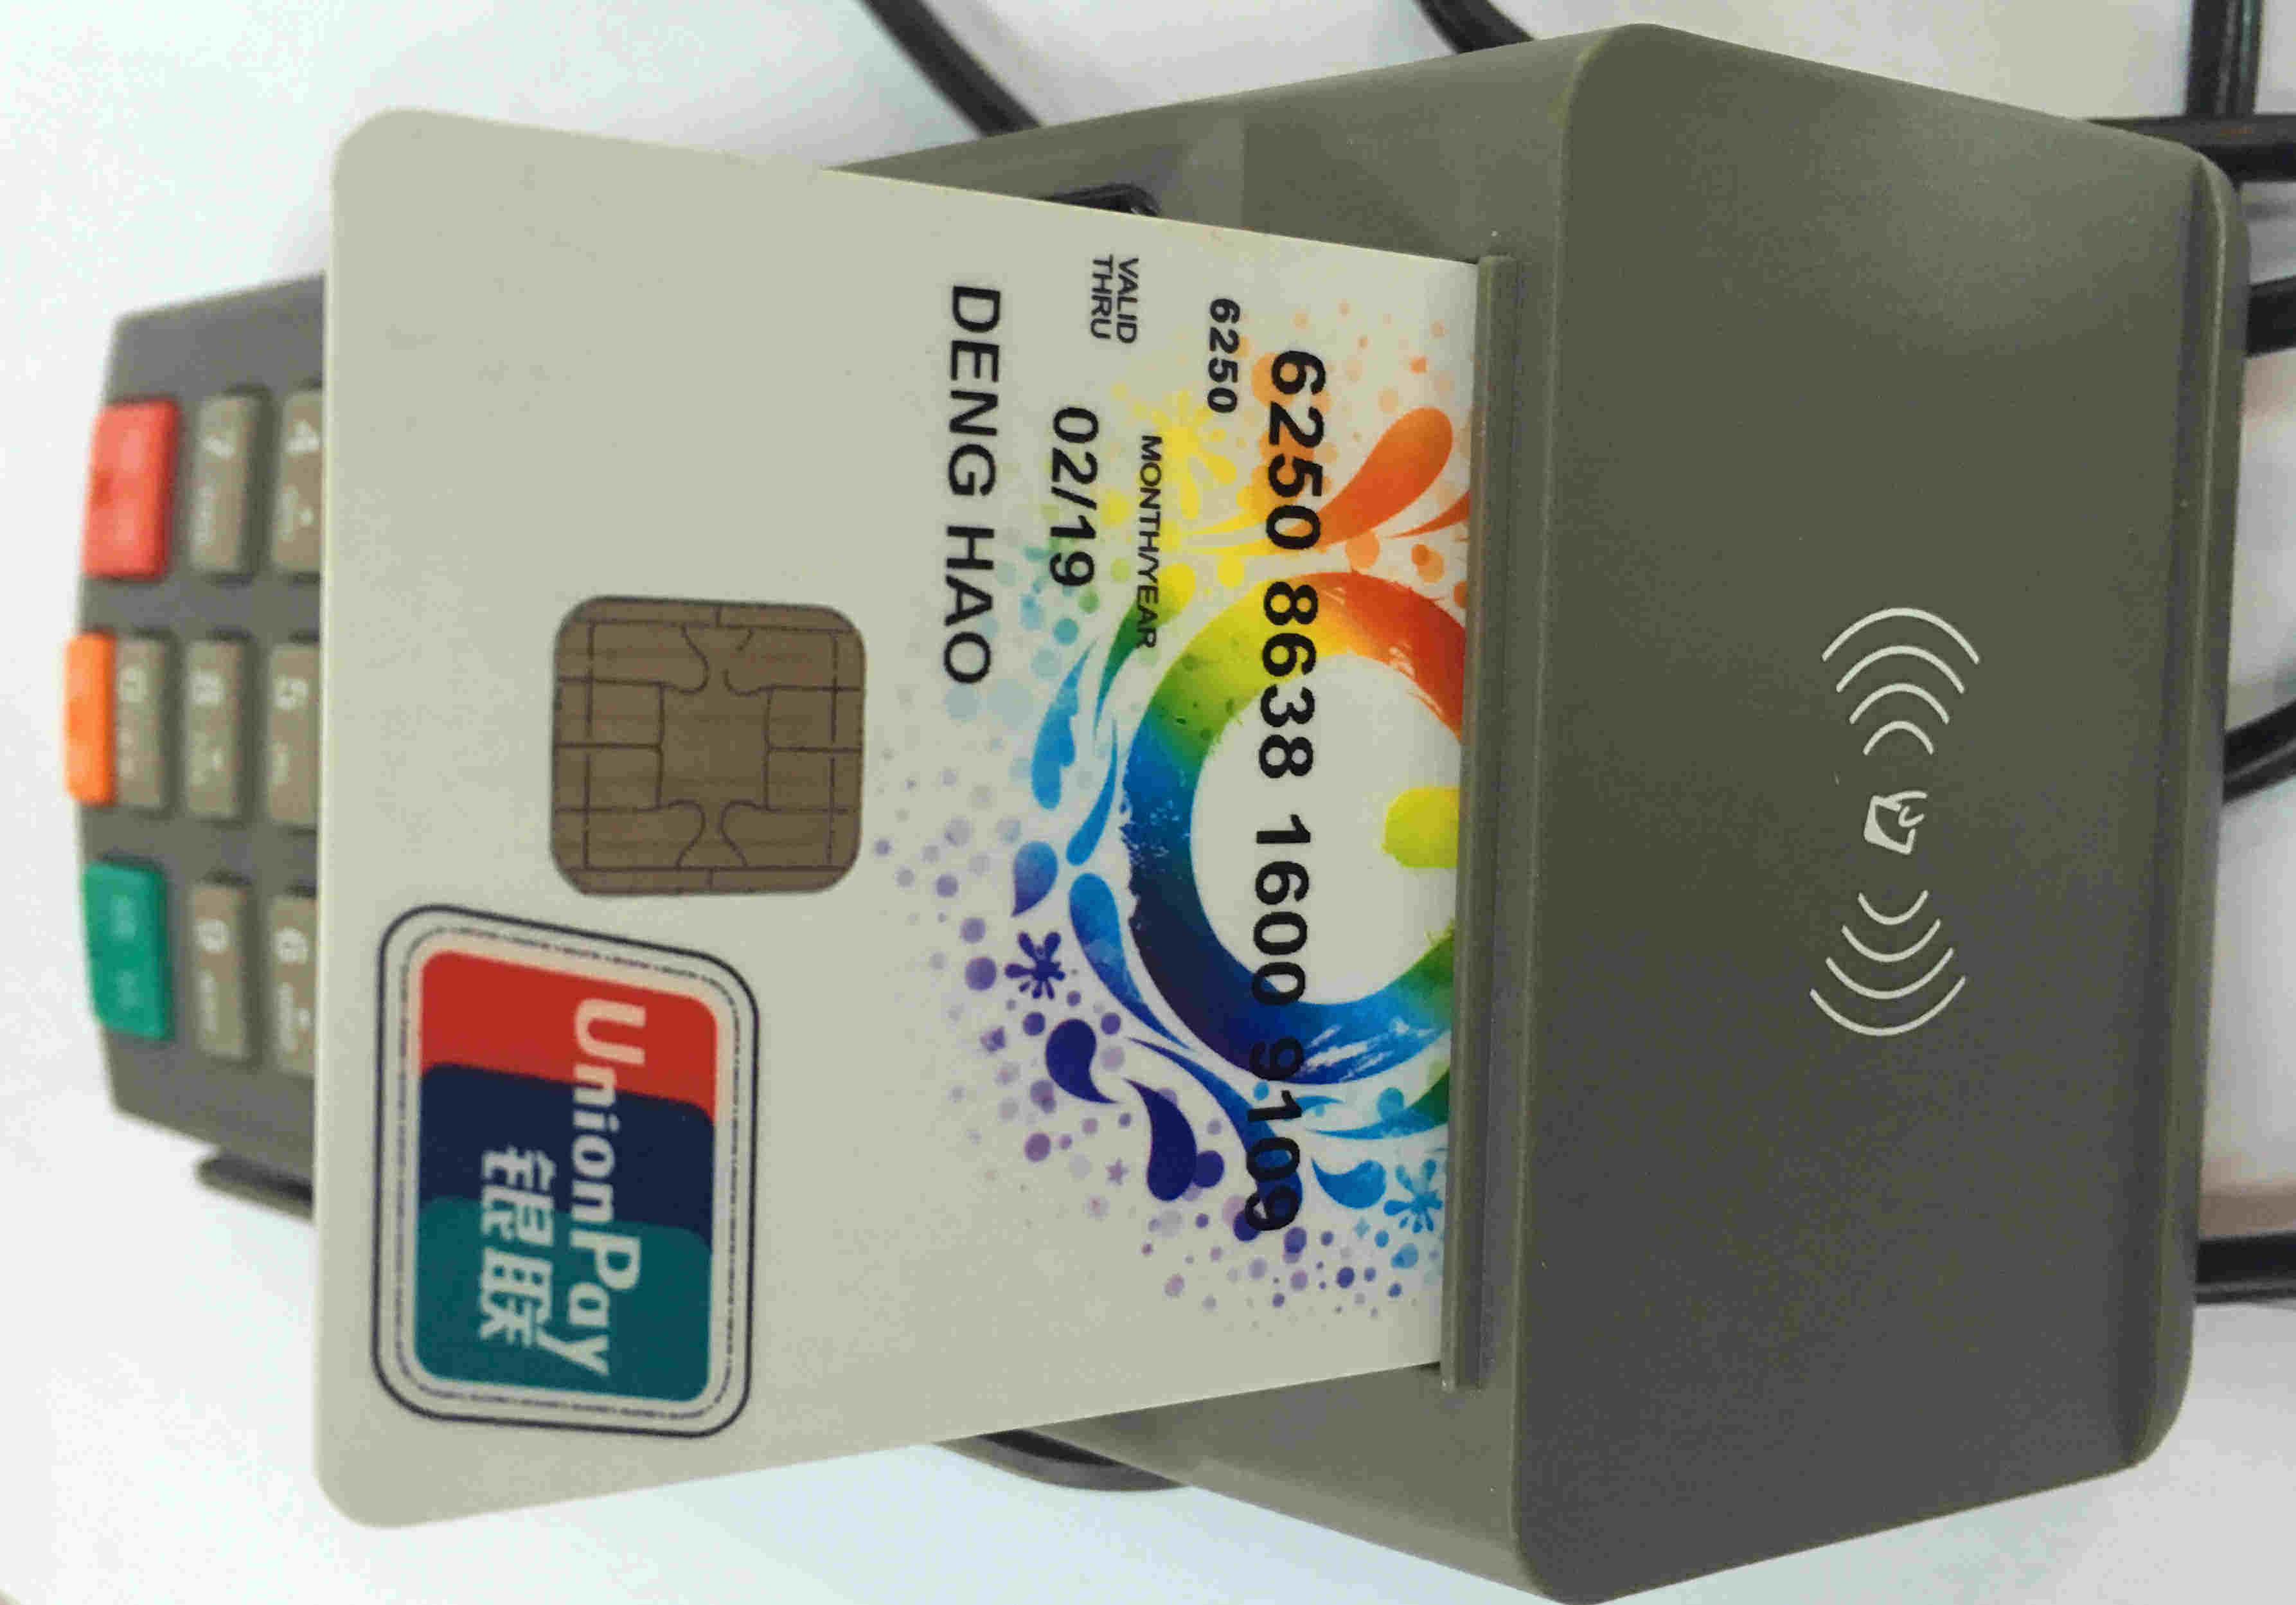 Msr, EMV Smart IC Card Reader with Pinpad (Z90)